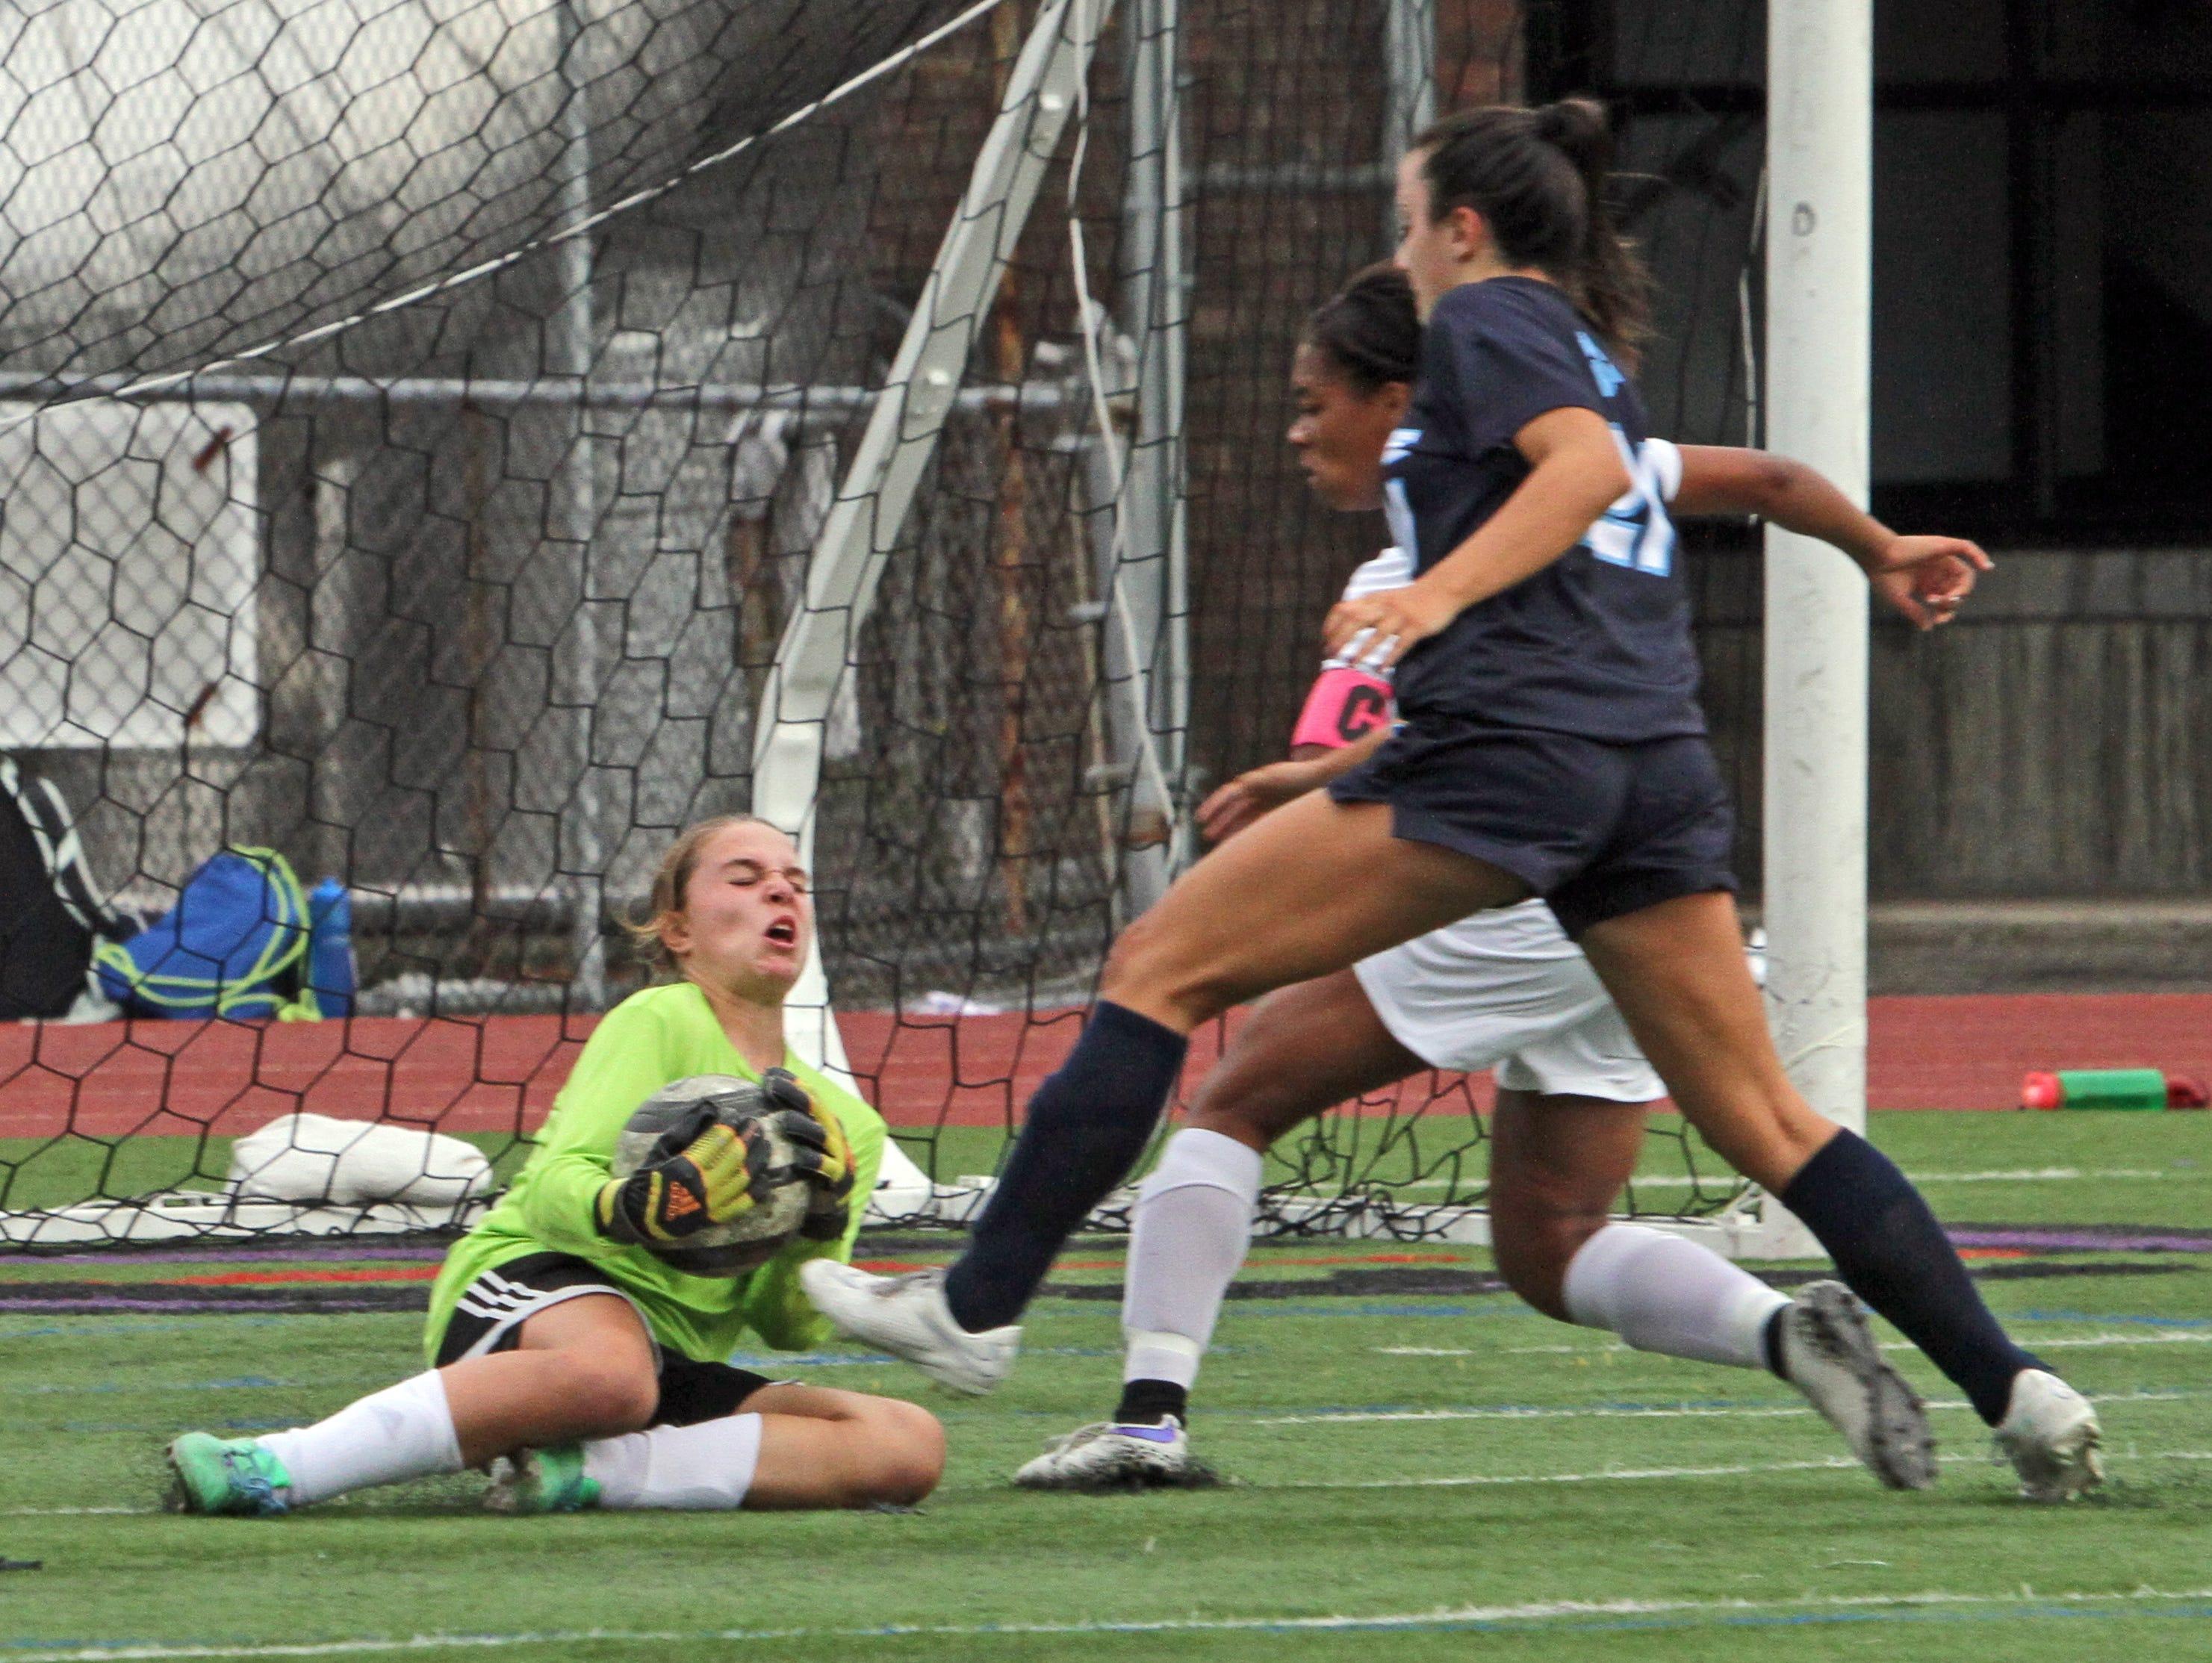 New Rochelle keeper Alexa Ostrager traps the ball as Ursuline's Julianna Sullivan bears down on her during a varsity soccer match at New Rochelle High School Sept. 30, 3015.